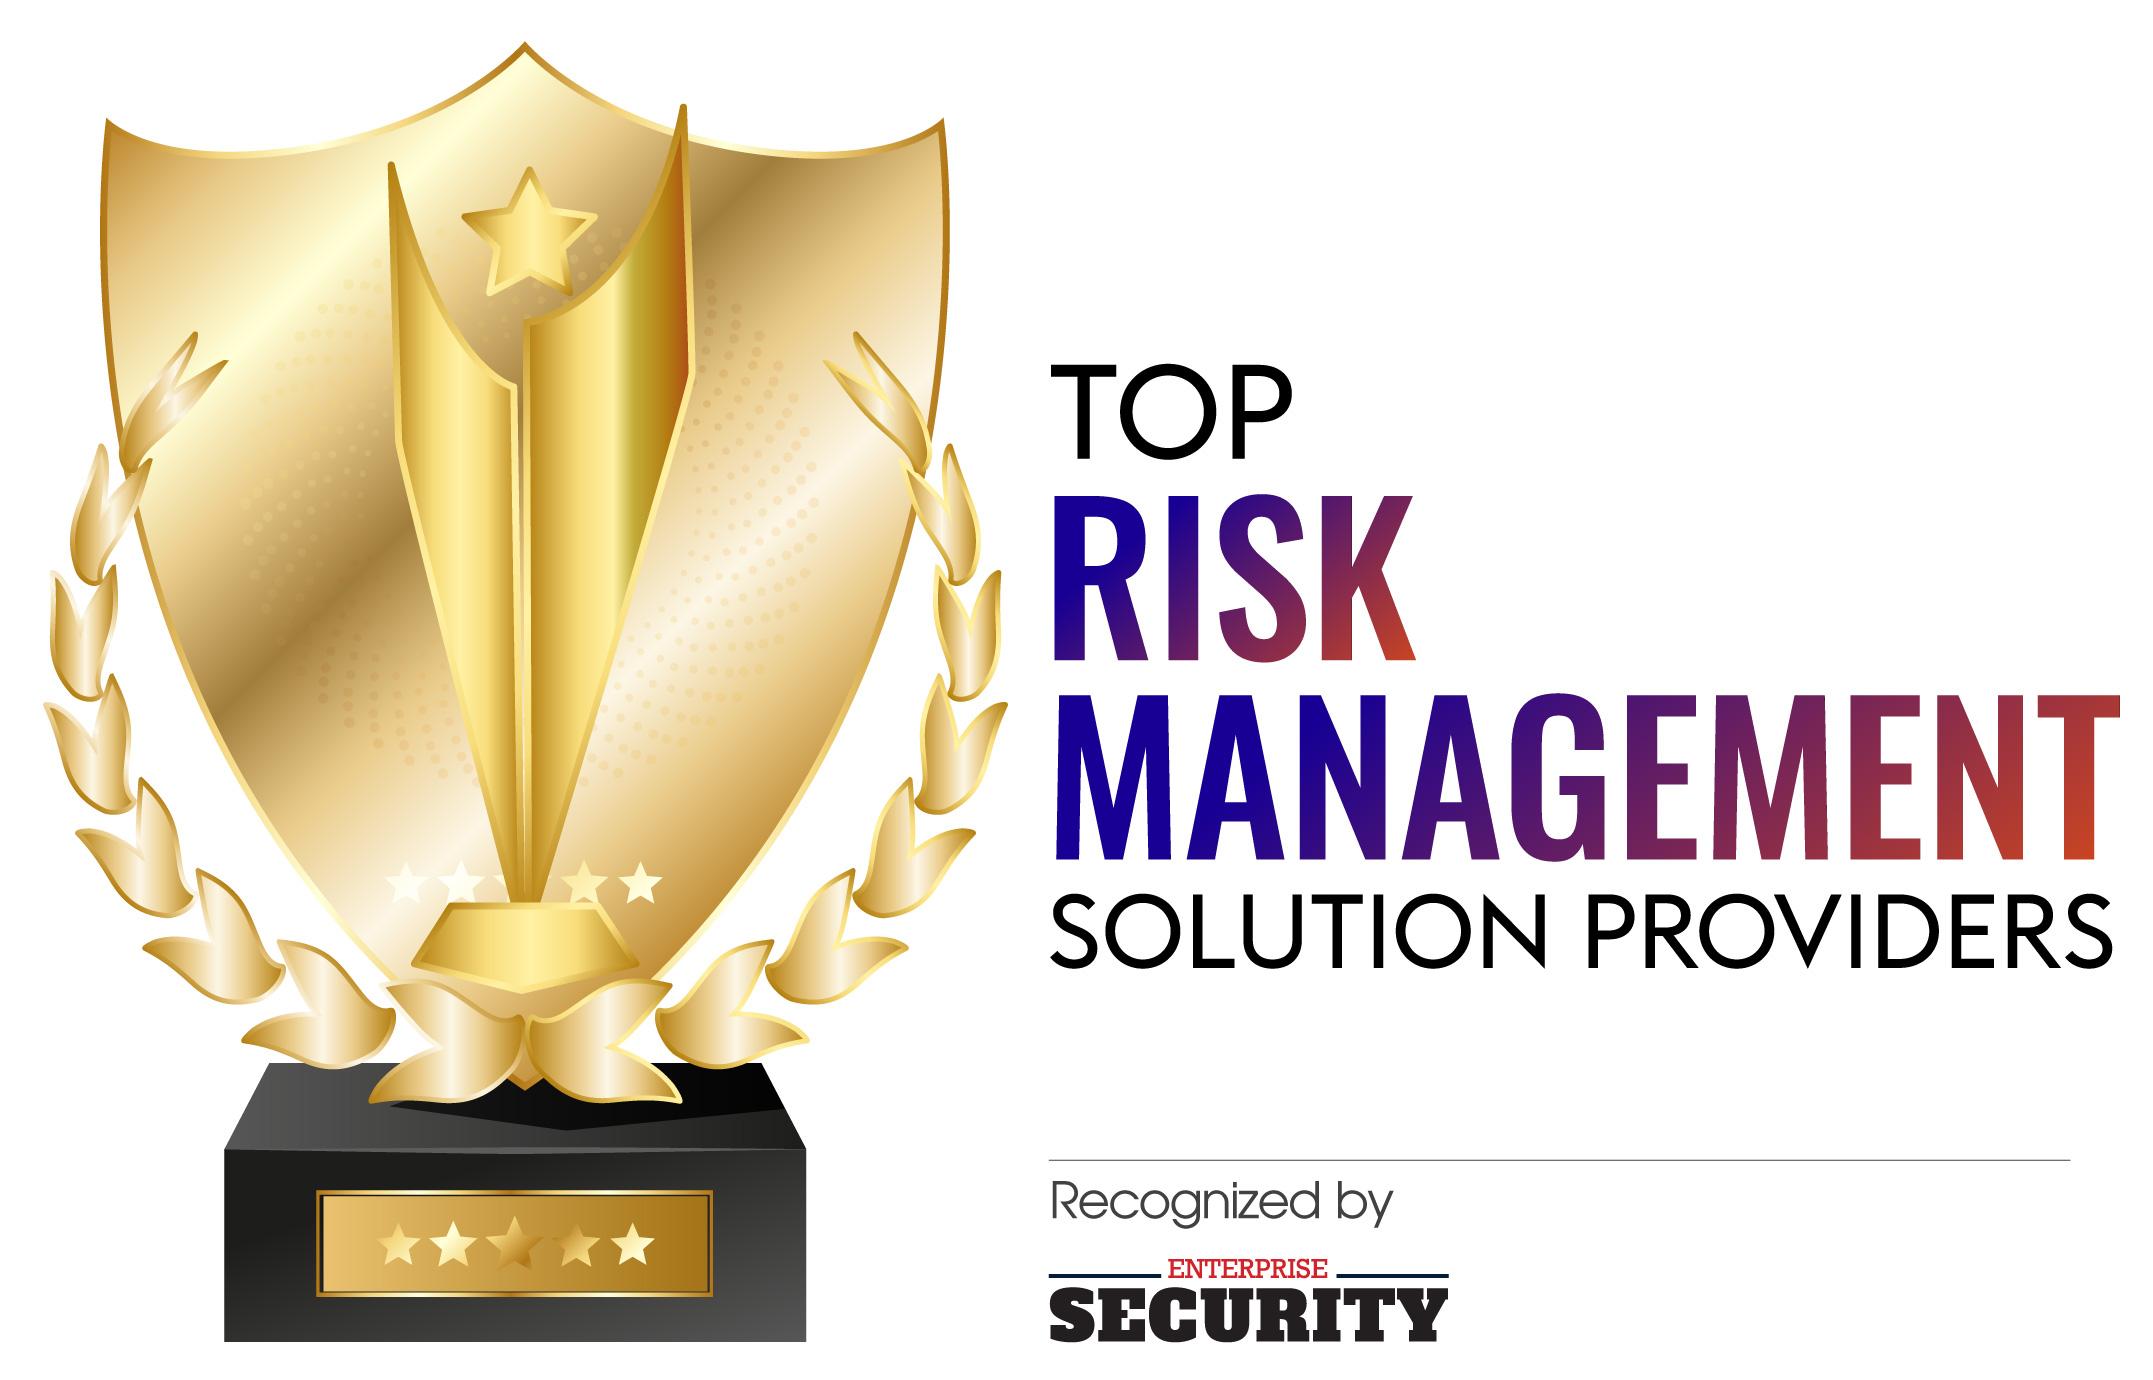 Top Risk Management Solution Companies